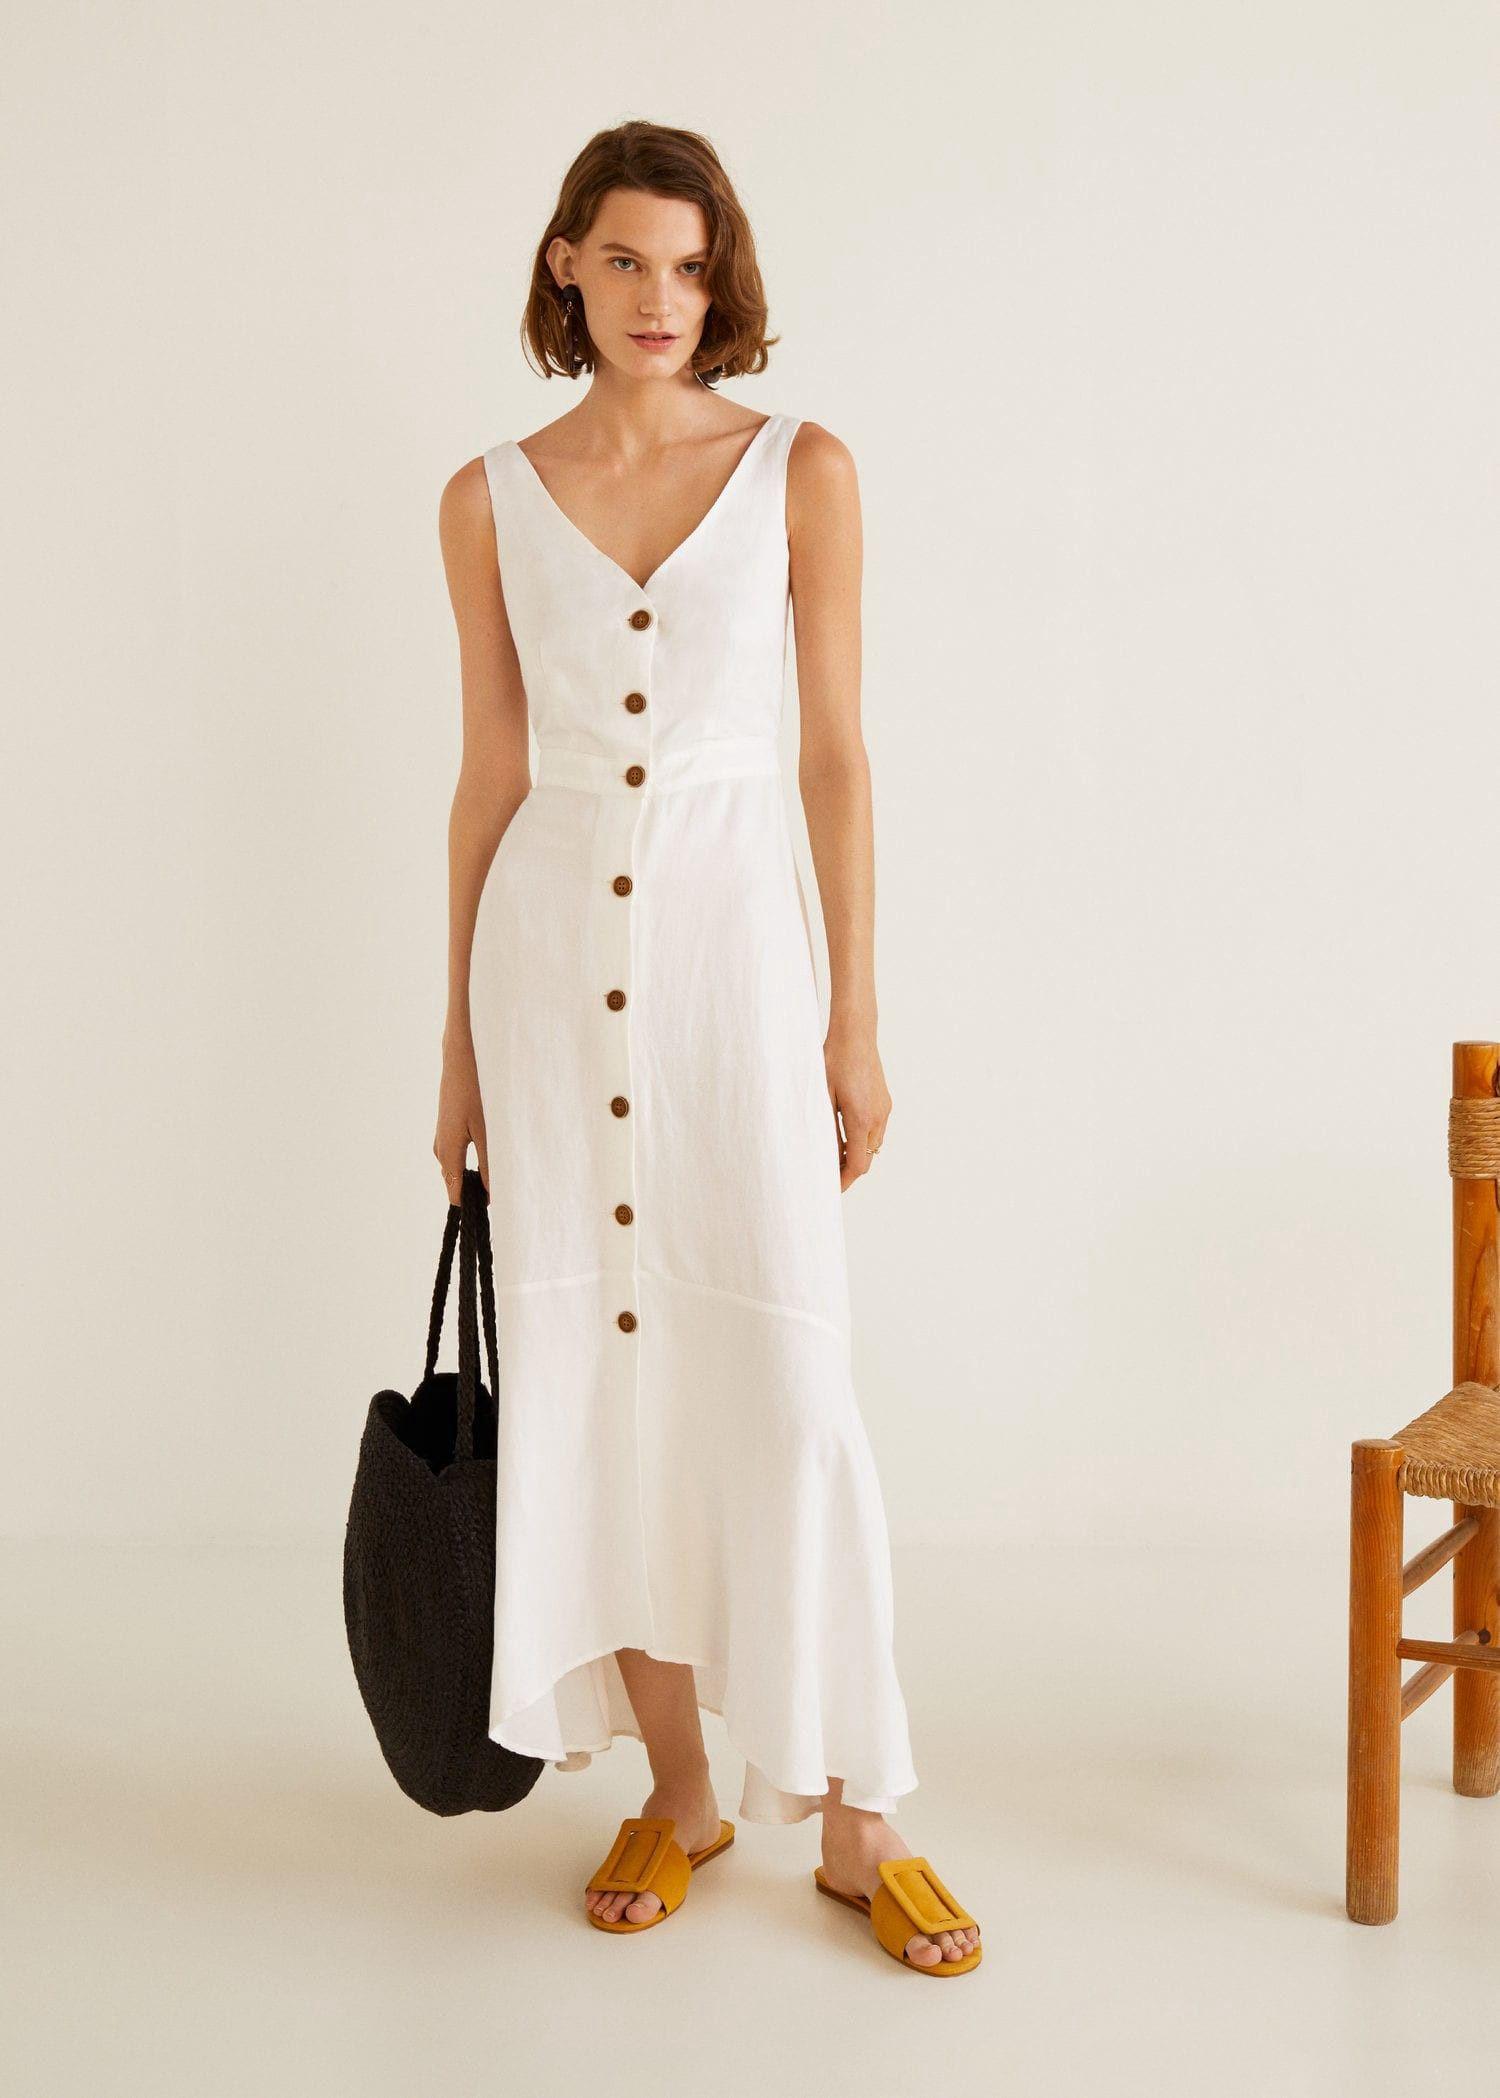 9b5f7b78d1 Mango Ruffled Linen Dress - 4